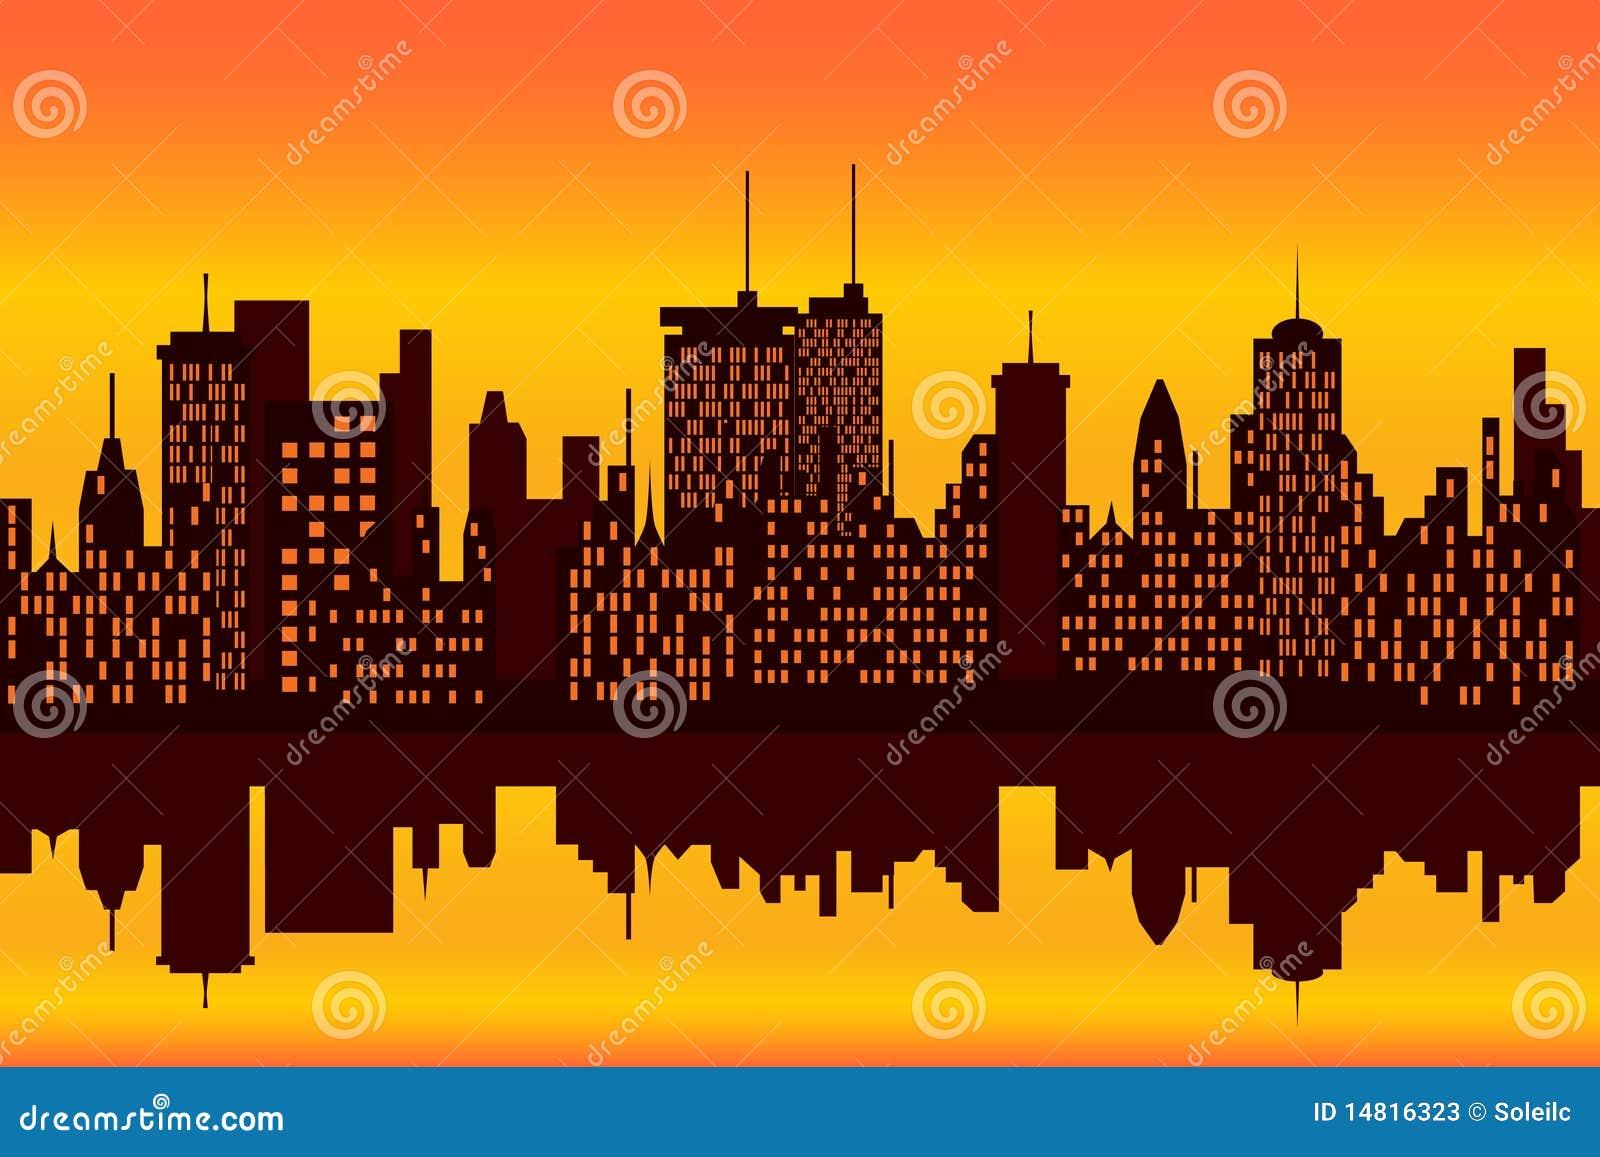 Stadt skyline am sonnenuntergang oder am sonnenaufgang - Dessin coucher de soleil ...